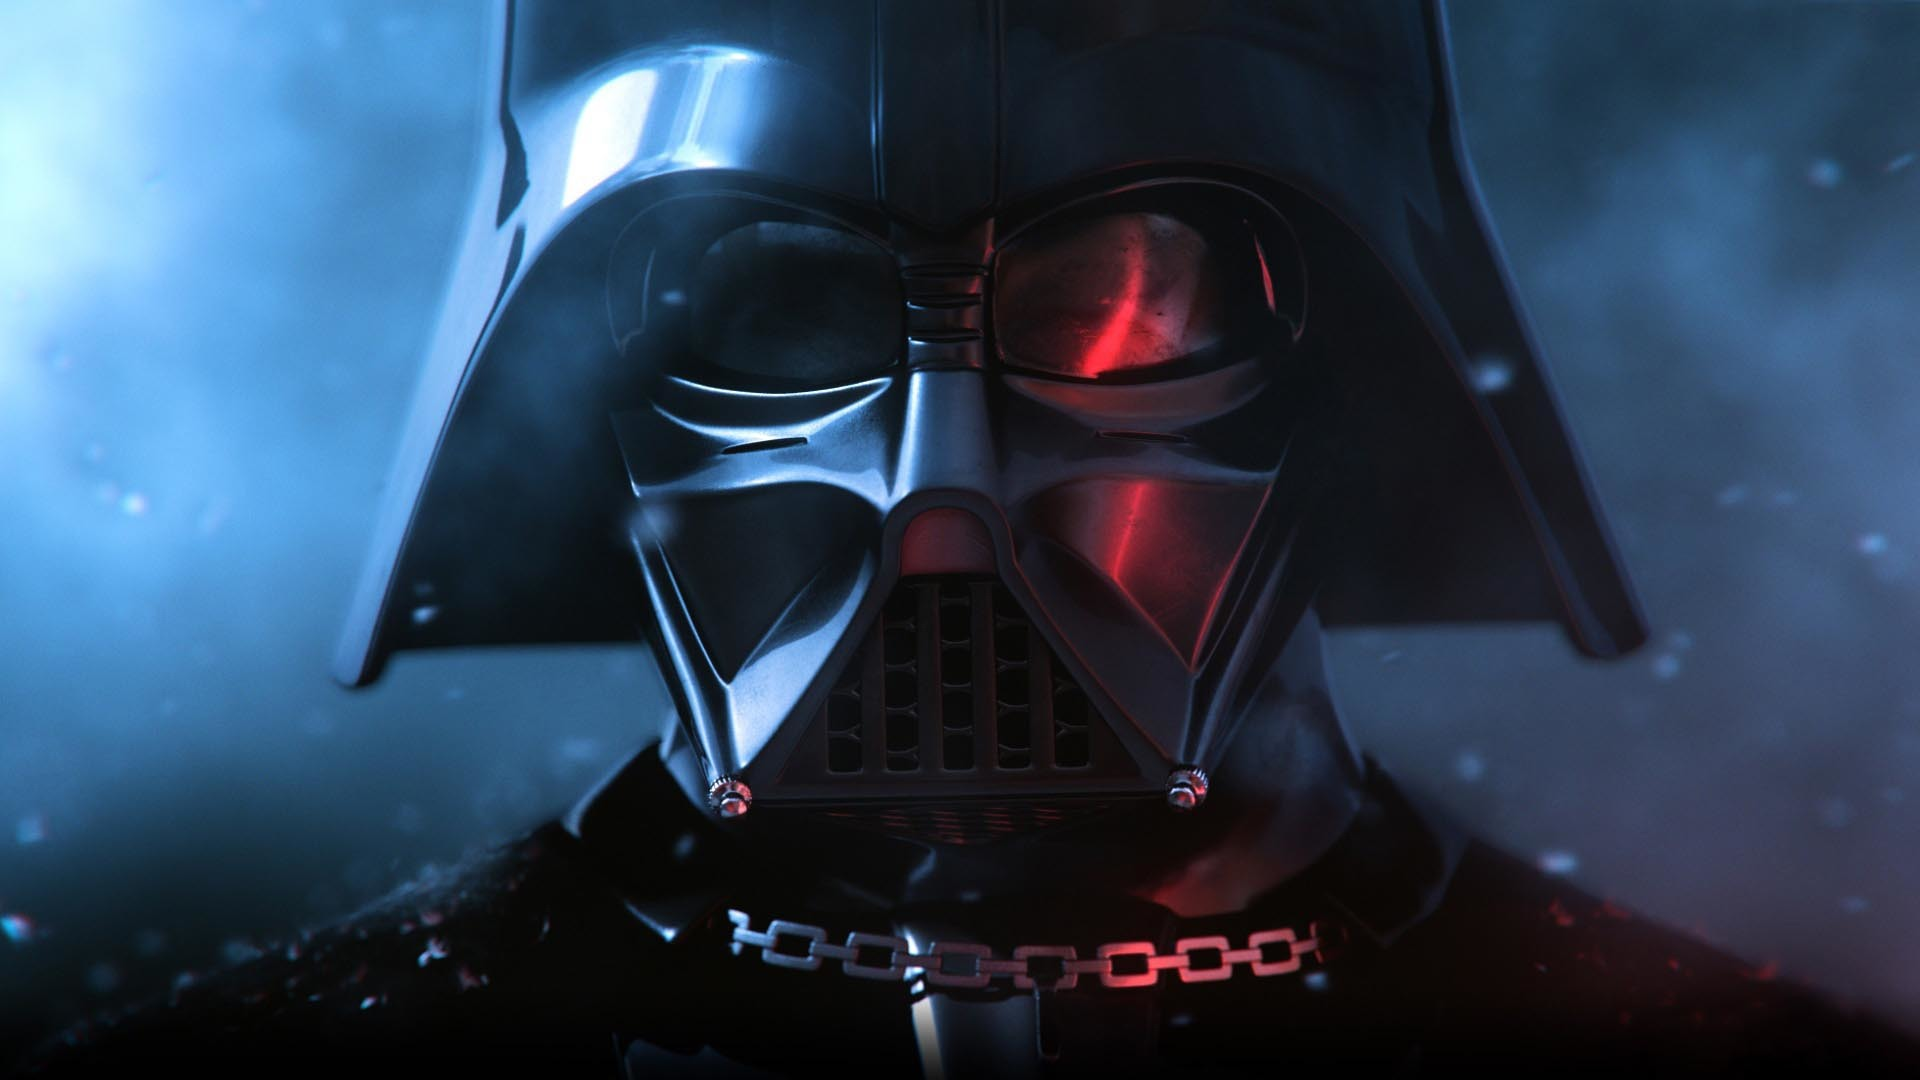 Star Wars Jedi: Fallen Order bude odhalen 13. dubna